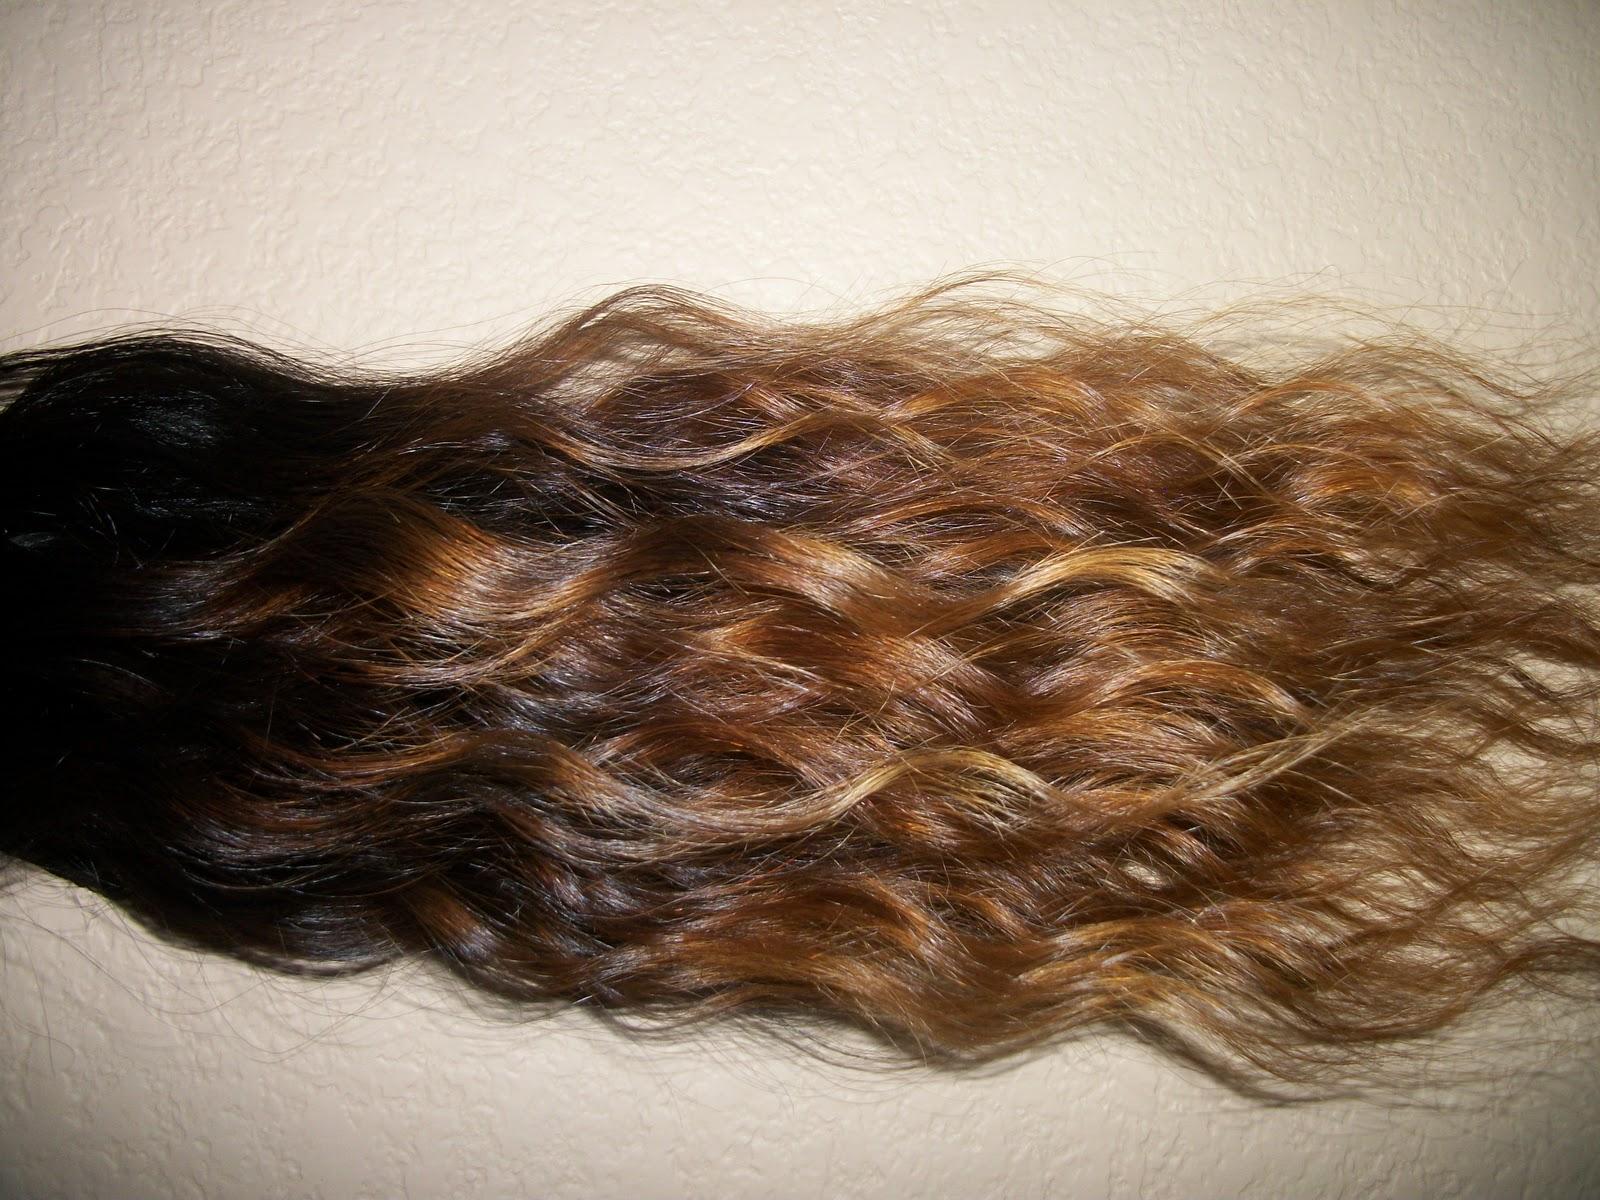 Coloring Hair Extensions (Plastic Bag Method) | Beau Co Hair